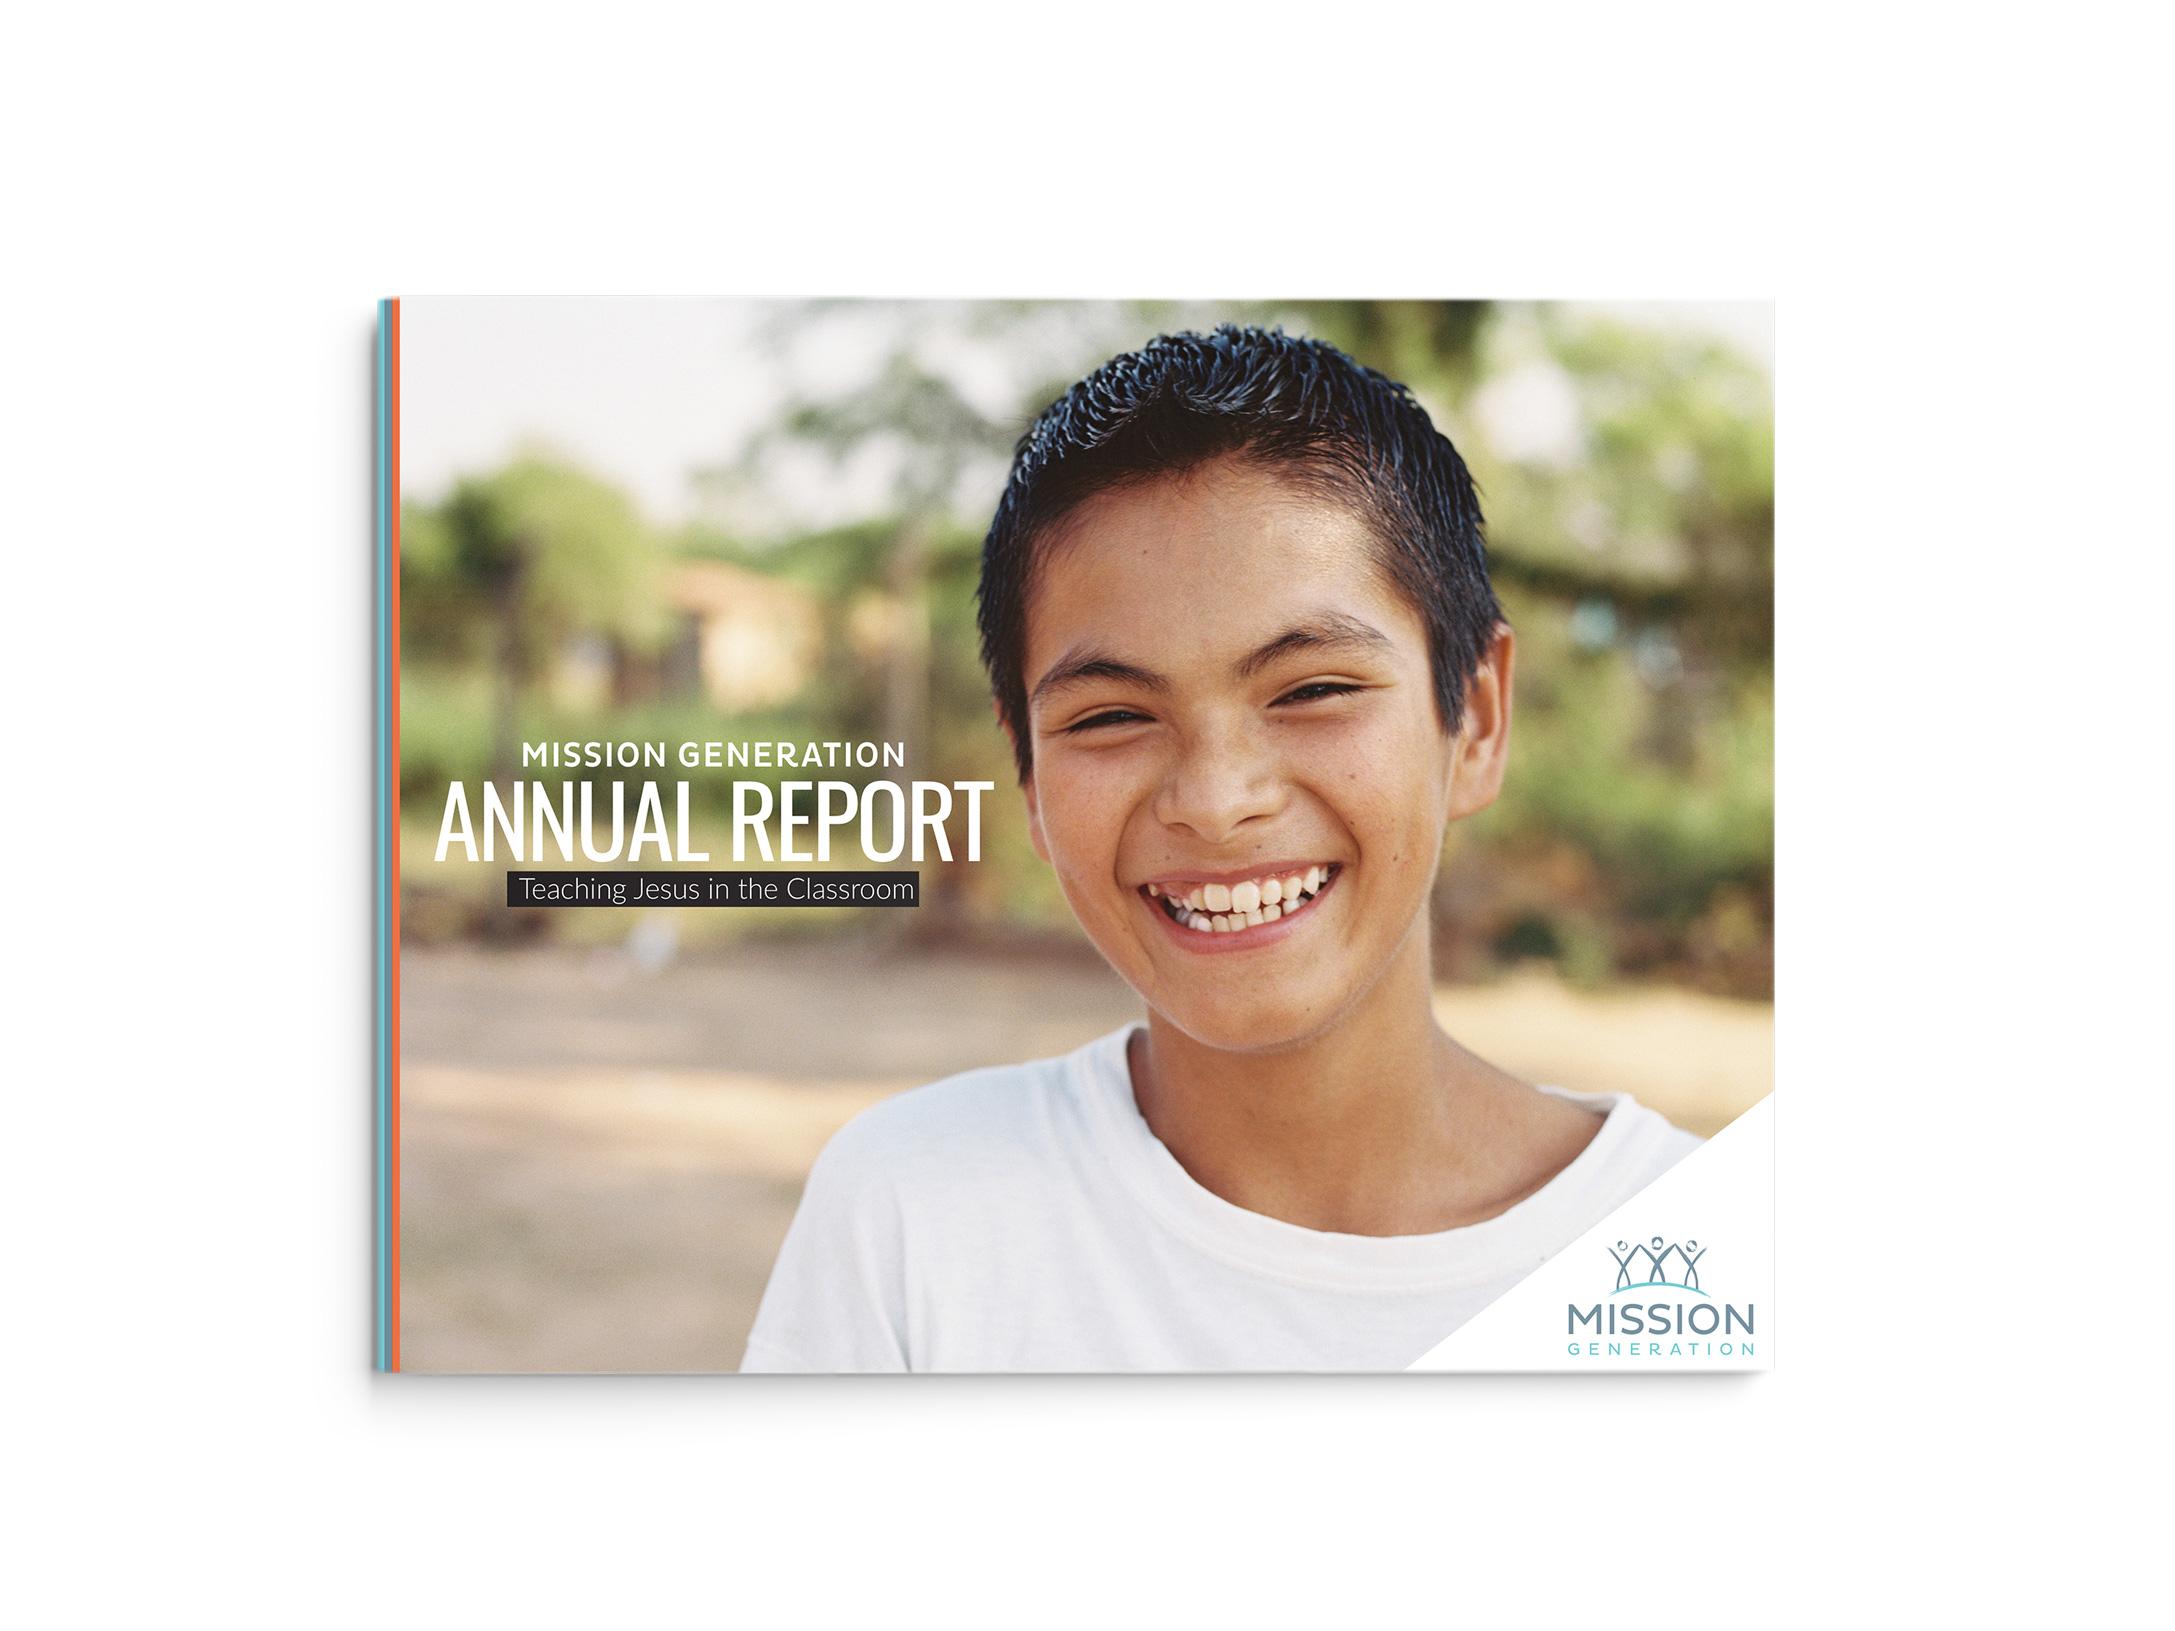 MG-AnnualReport.jpg